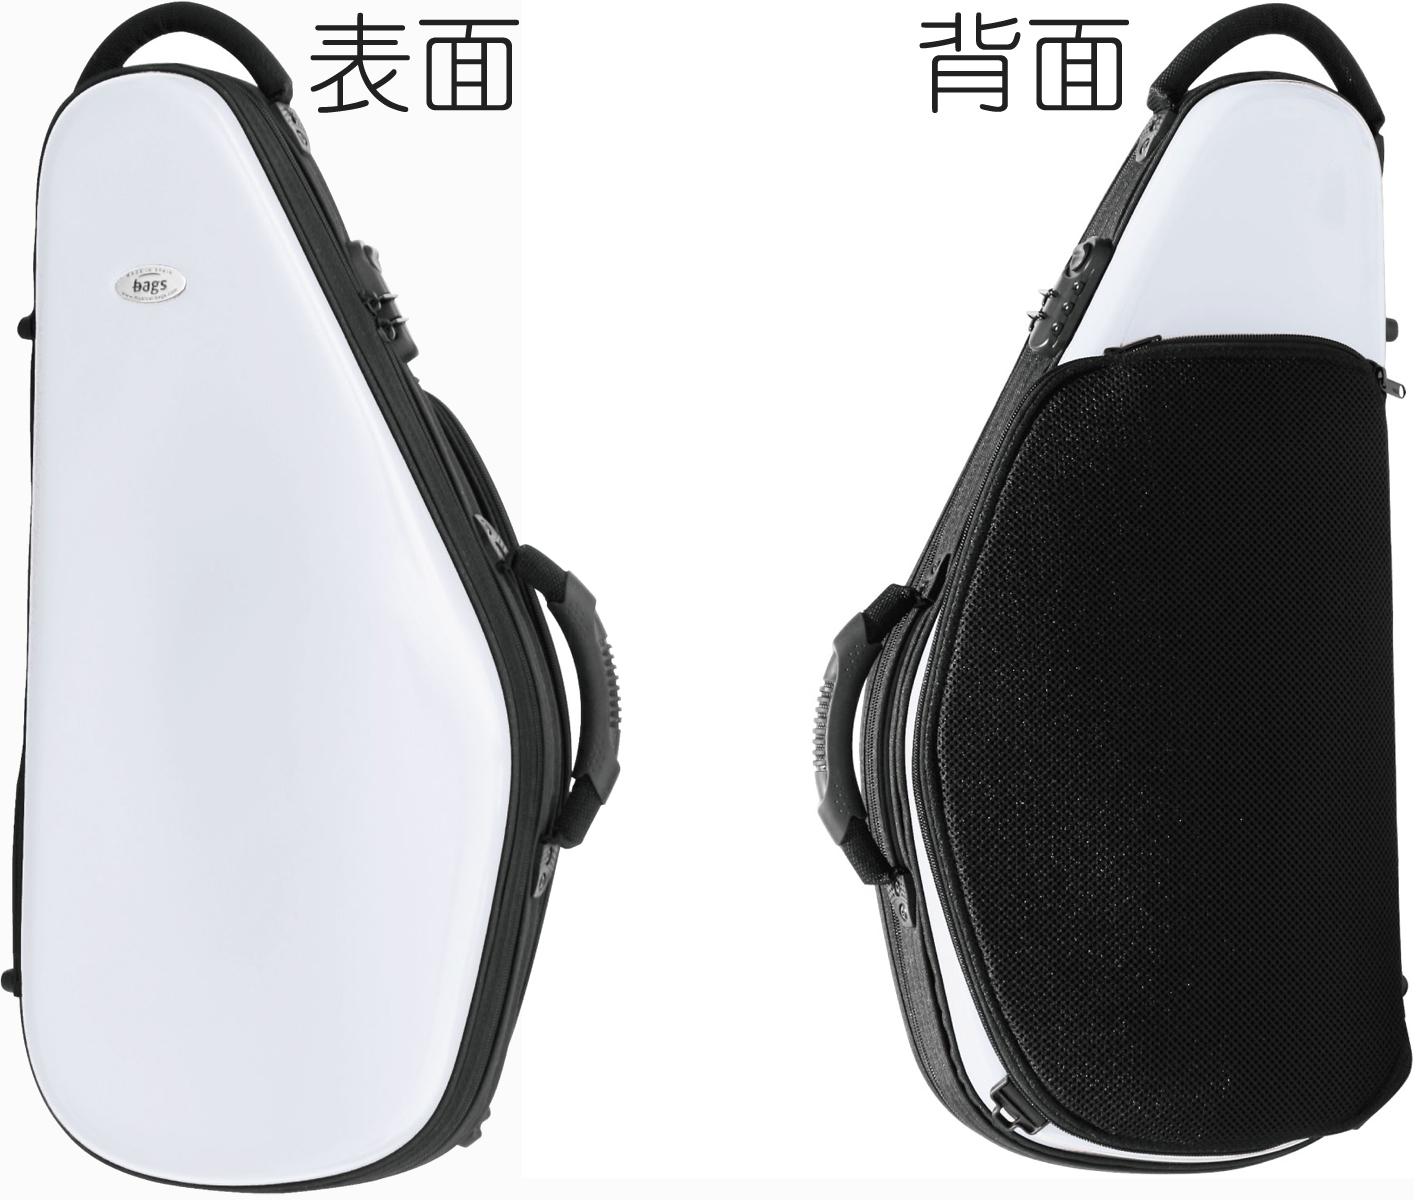 bags ( バッグス ) EFAS WHT アルトサックスケース ホワイト 白色 ハードケース リュック EVOLUTION alto saxophone case white 北海道 沖縄 離島不可